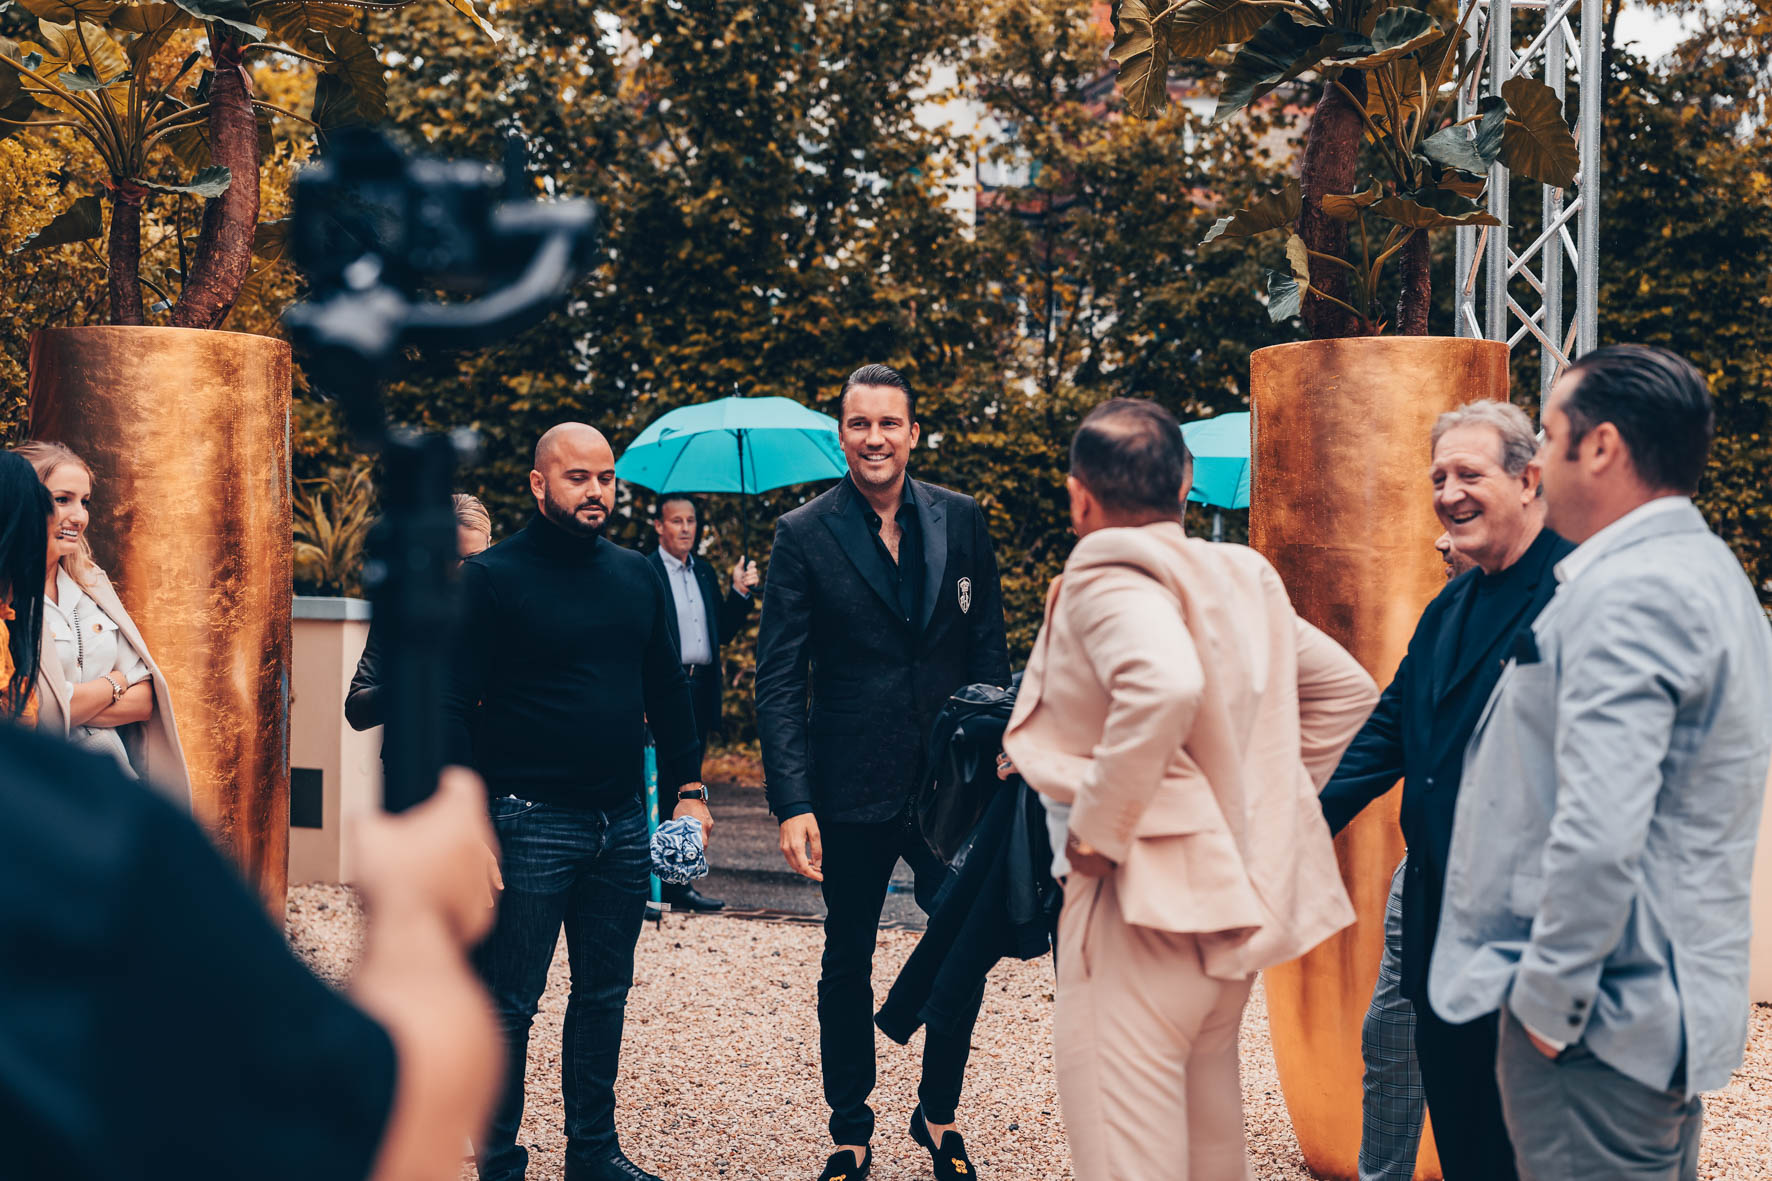 Konrad-lifestyle-art-basel-%22prestige%22-2019-8.jpg